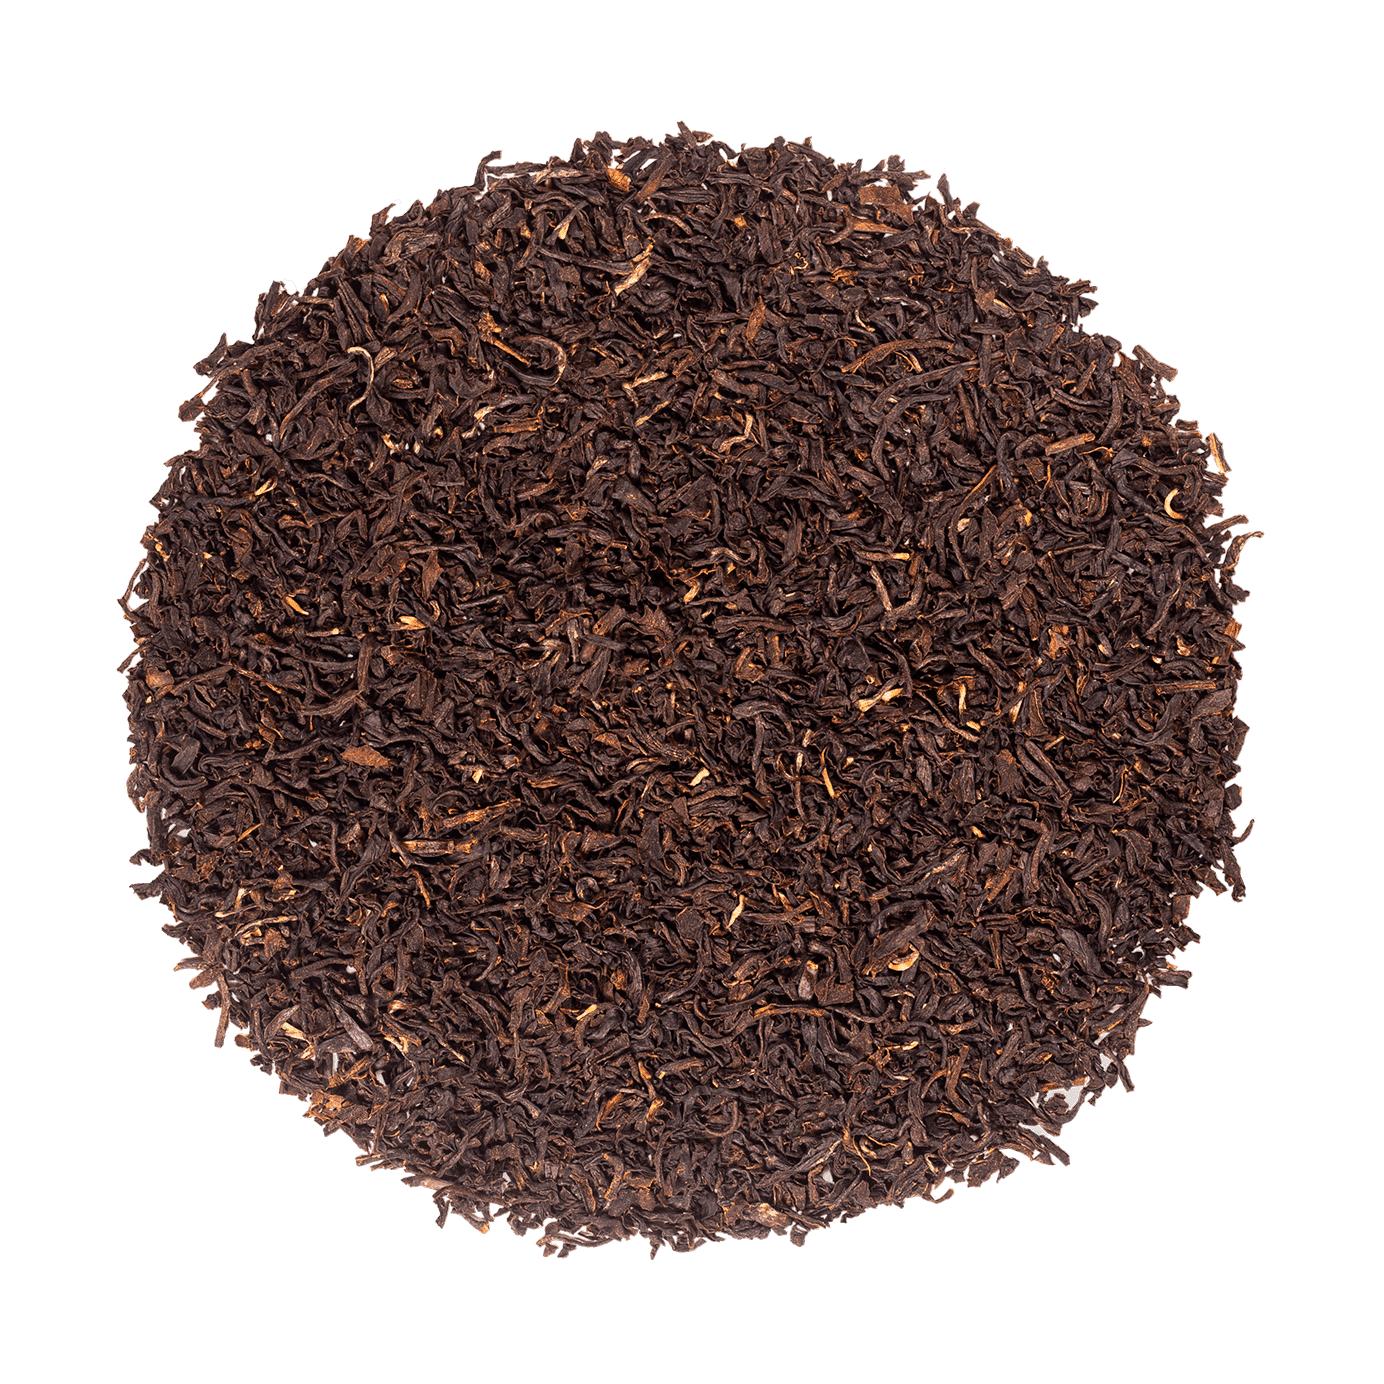 KUSMI TEA Assam bio - Thé noir corsé d'Inde - Kusmi Tea